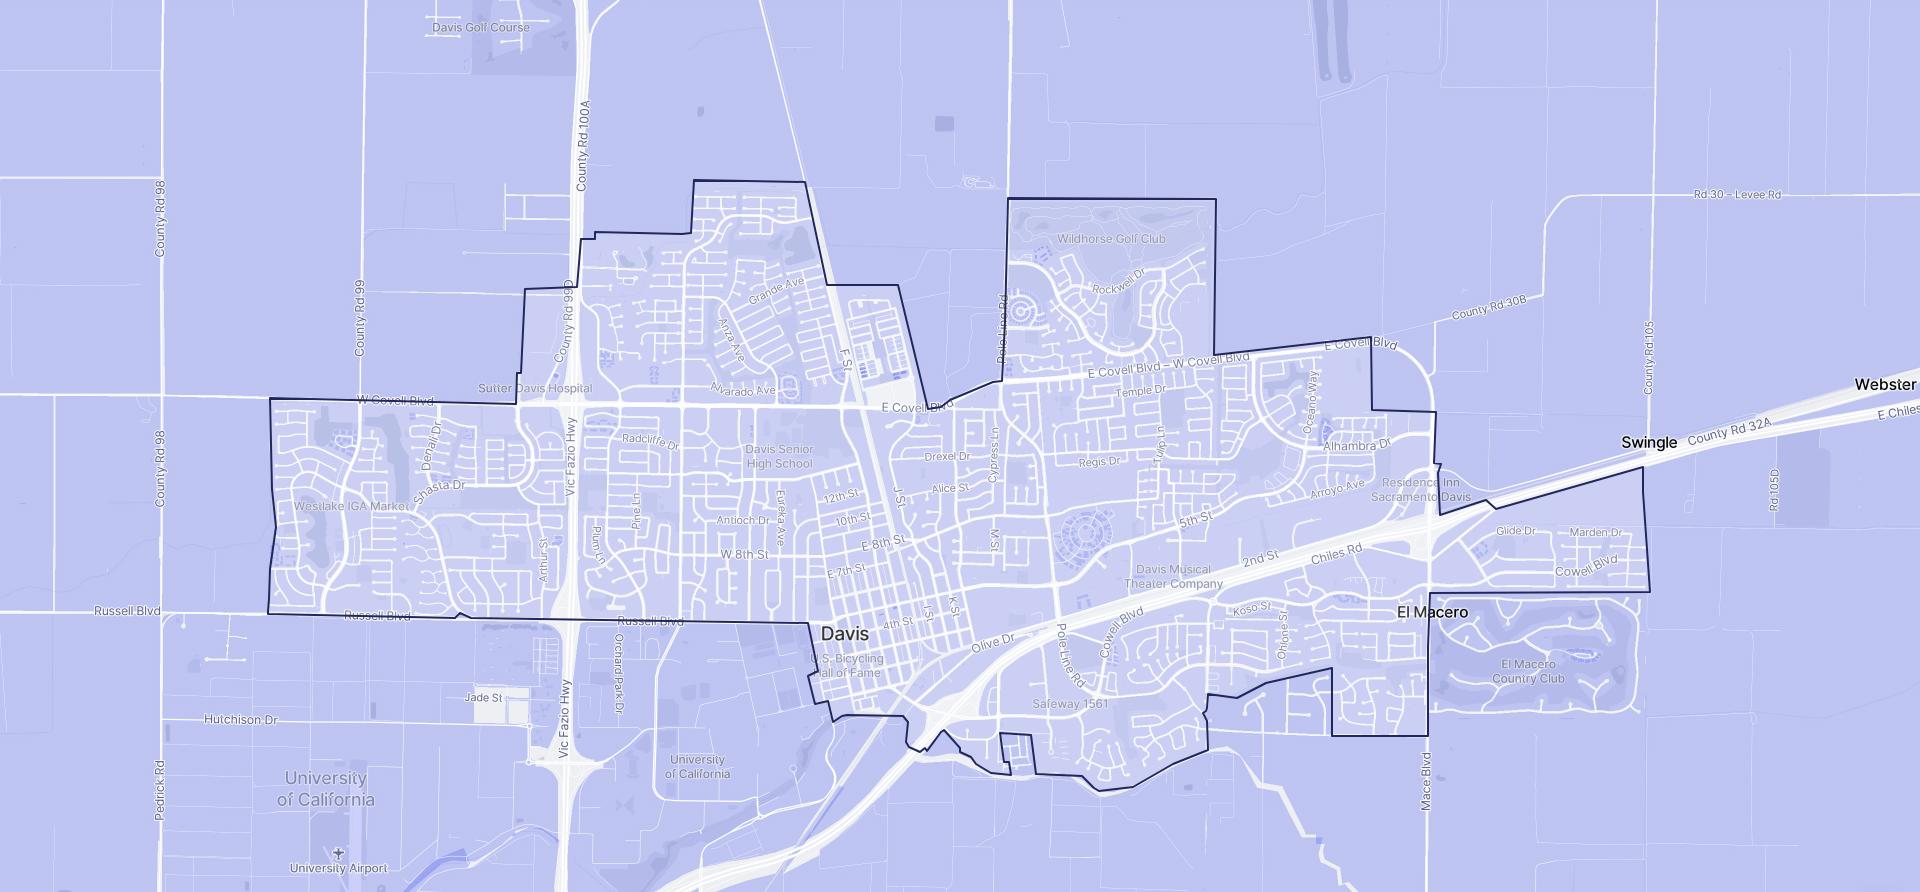 Image of Davis boundaries on a map.